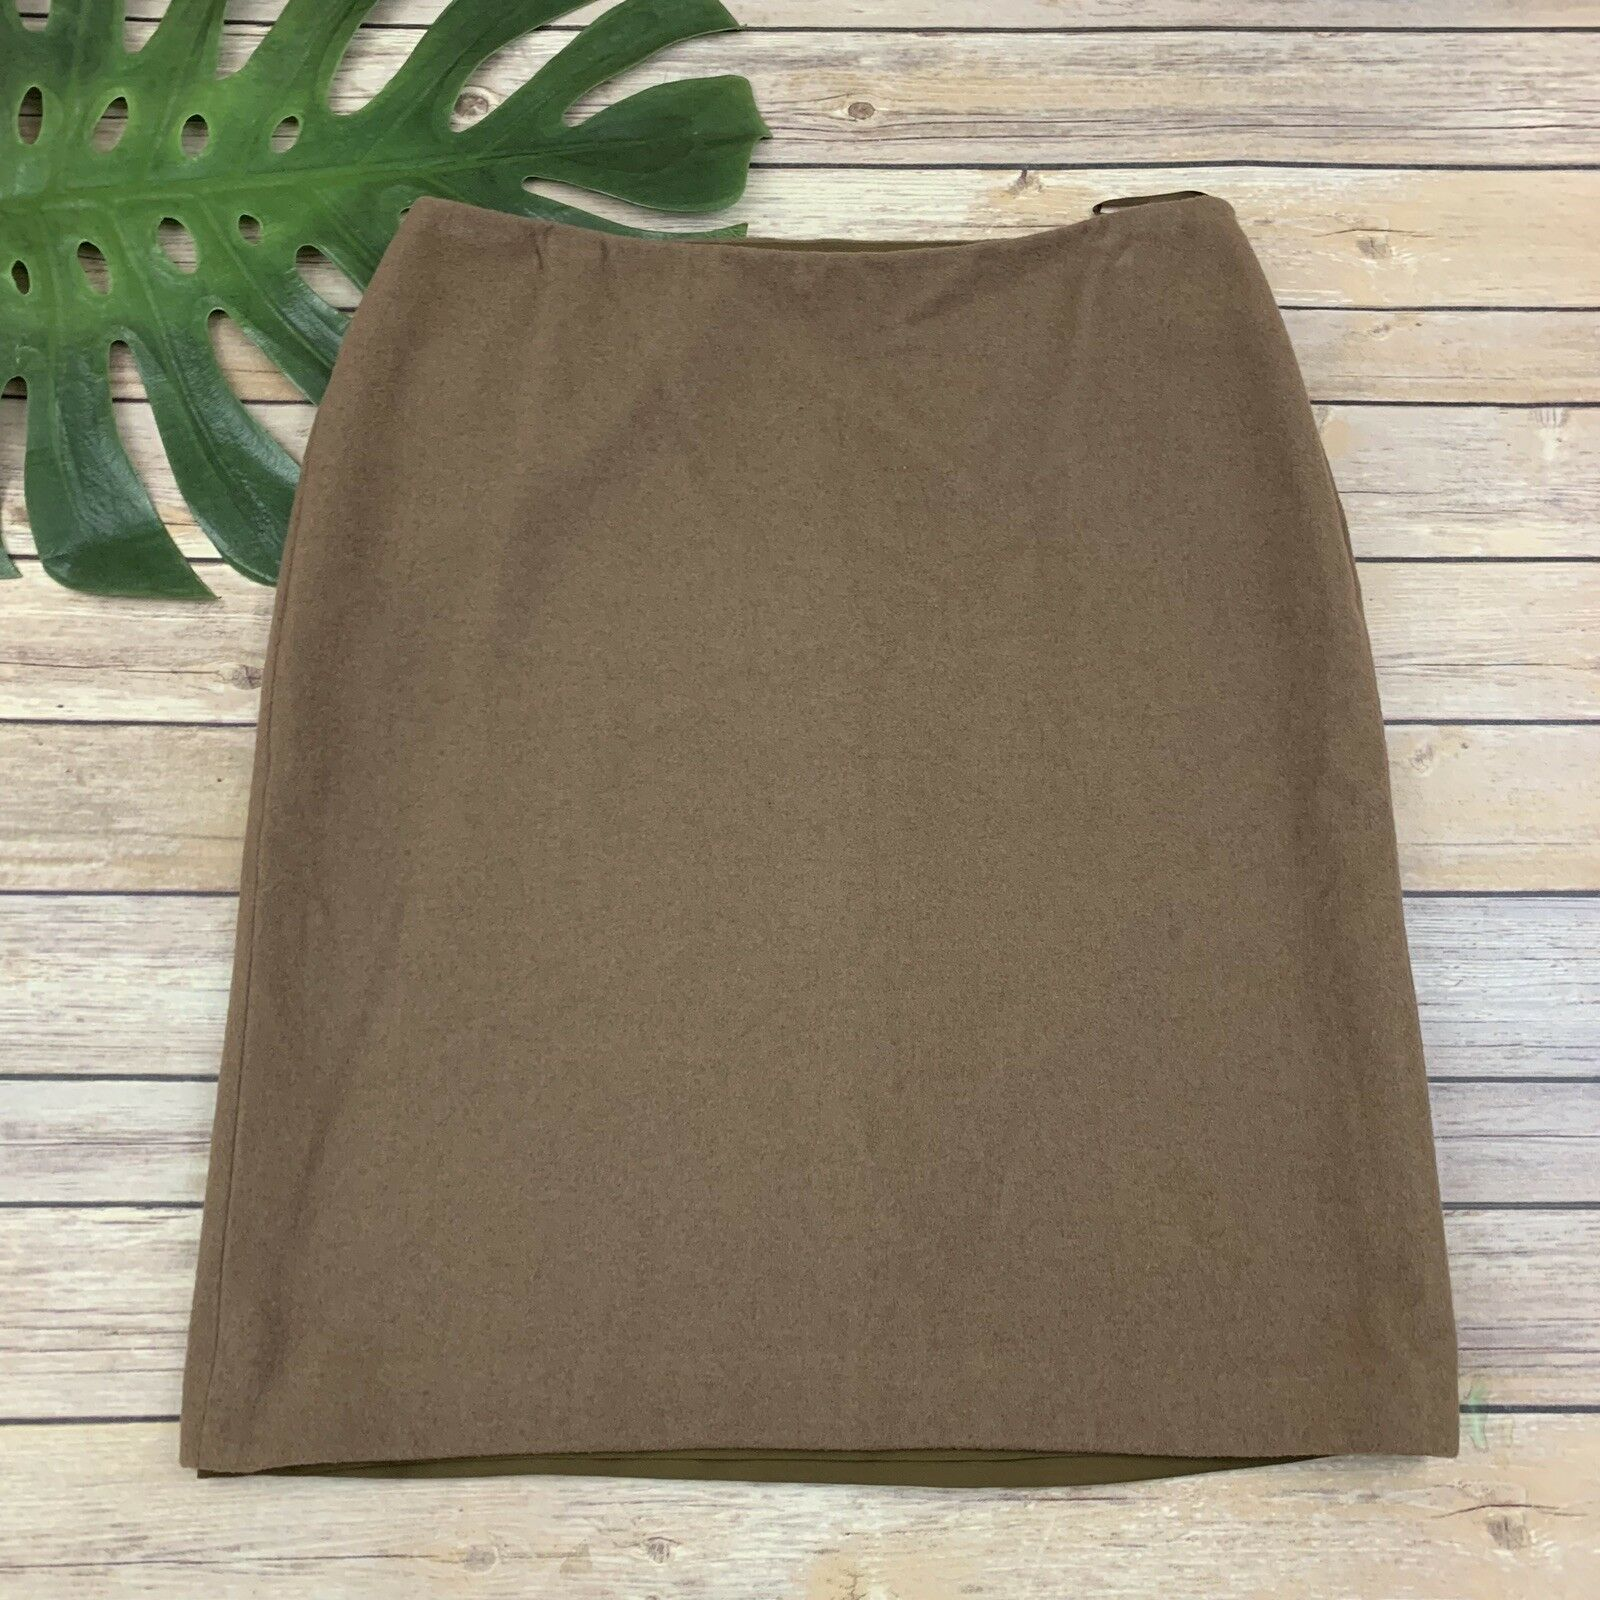 Jil Sander Womens Cashmere Pencil Skirt Size 38 6 Camel Brown Silk Lined Soft